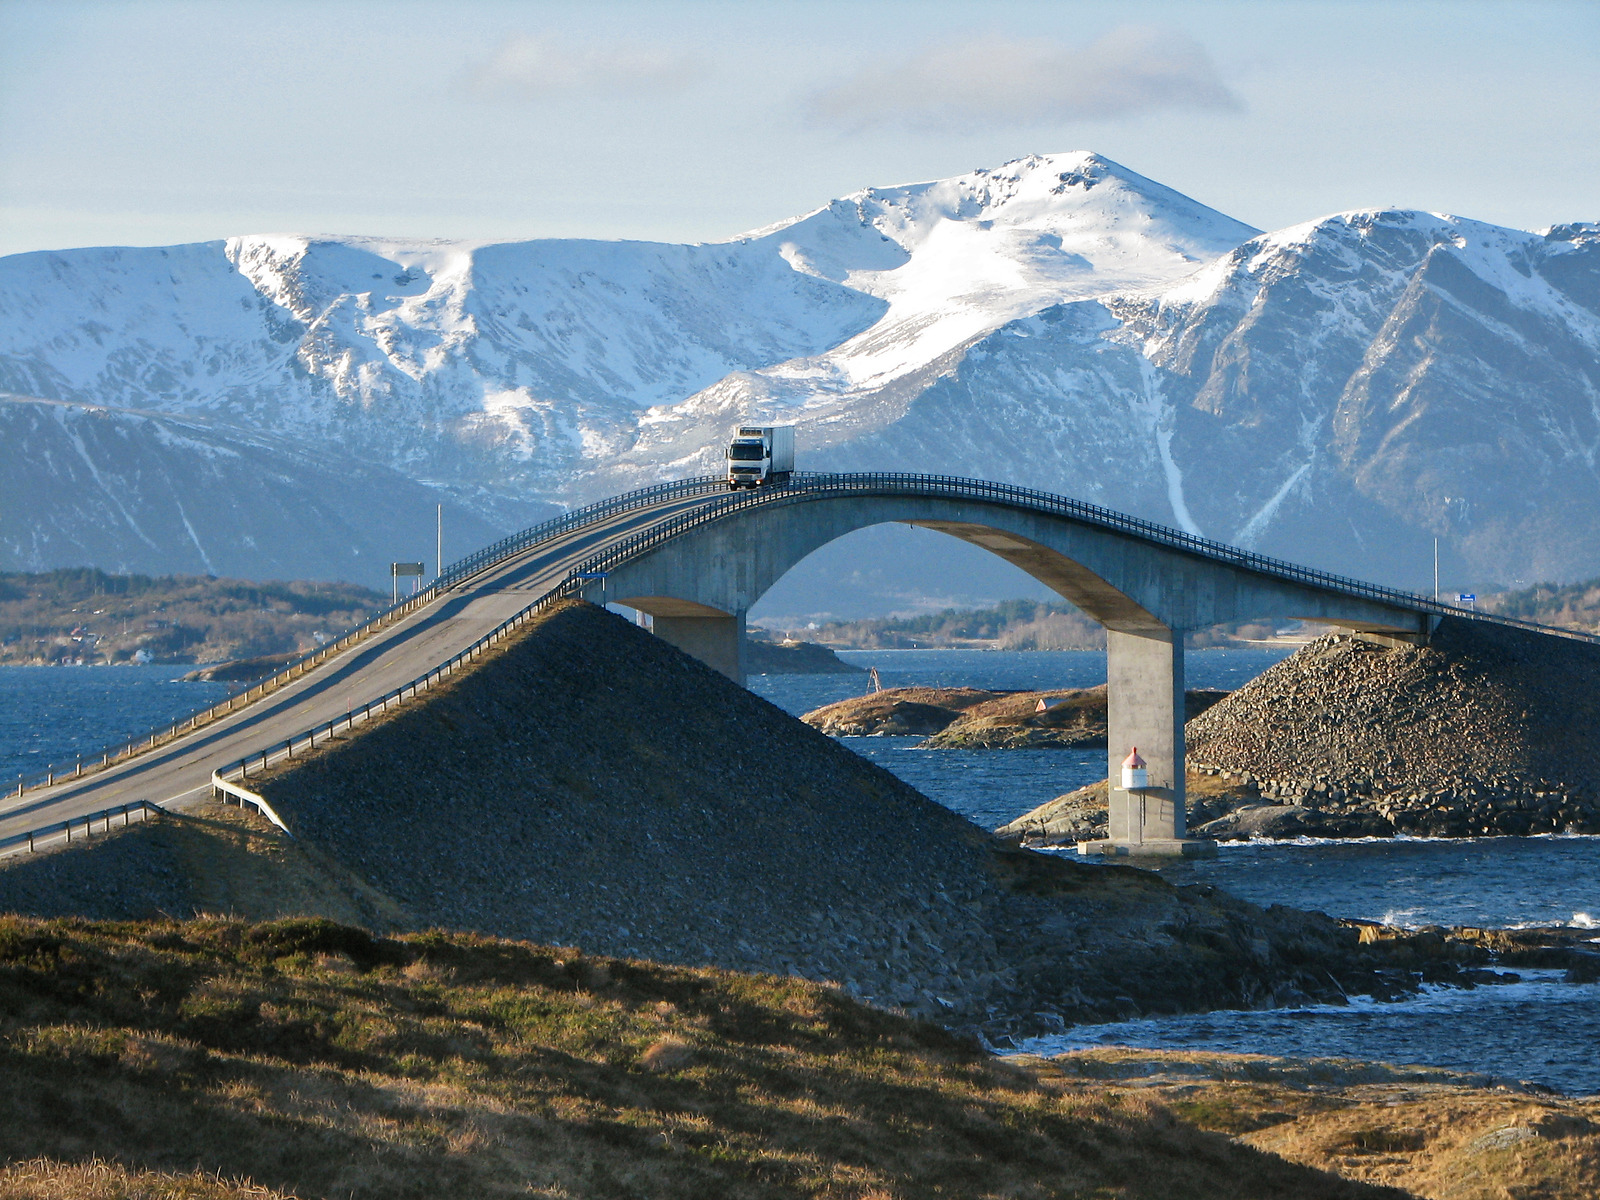 Atlantic Road / Atlanterhavsvegen, February 20th. Photo by Yngvild Meinseth / Statens Vegvesen.